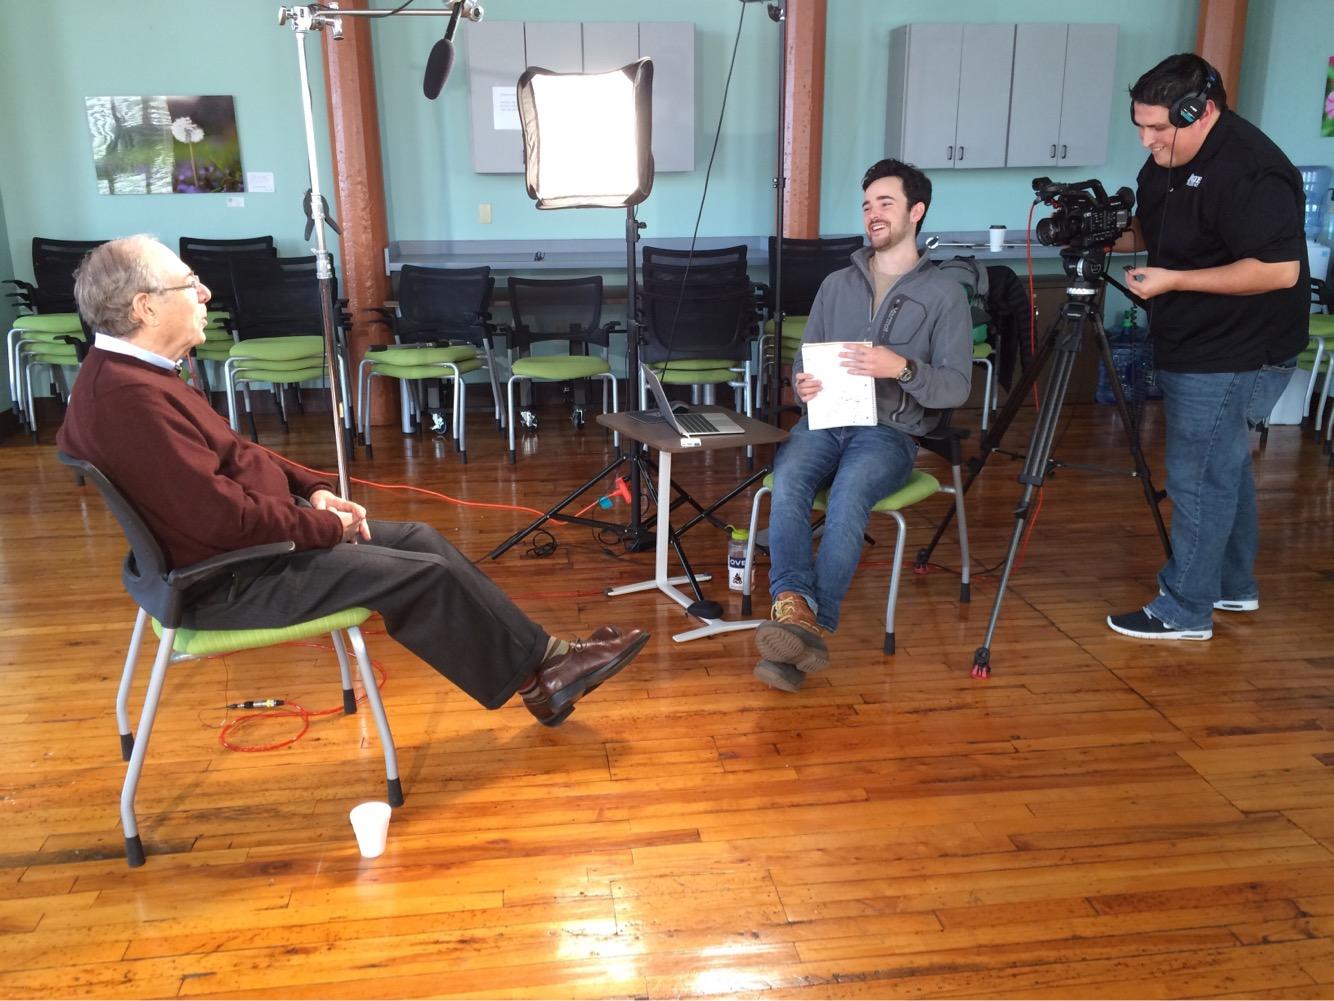 Dustin interviews legendary New York Times sportswriter and former ESPN ombudsman, Robert Lipsyte.